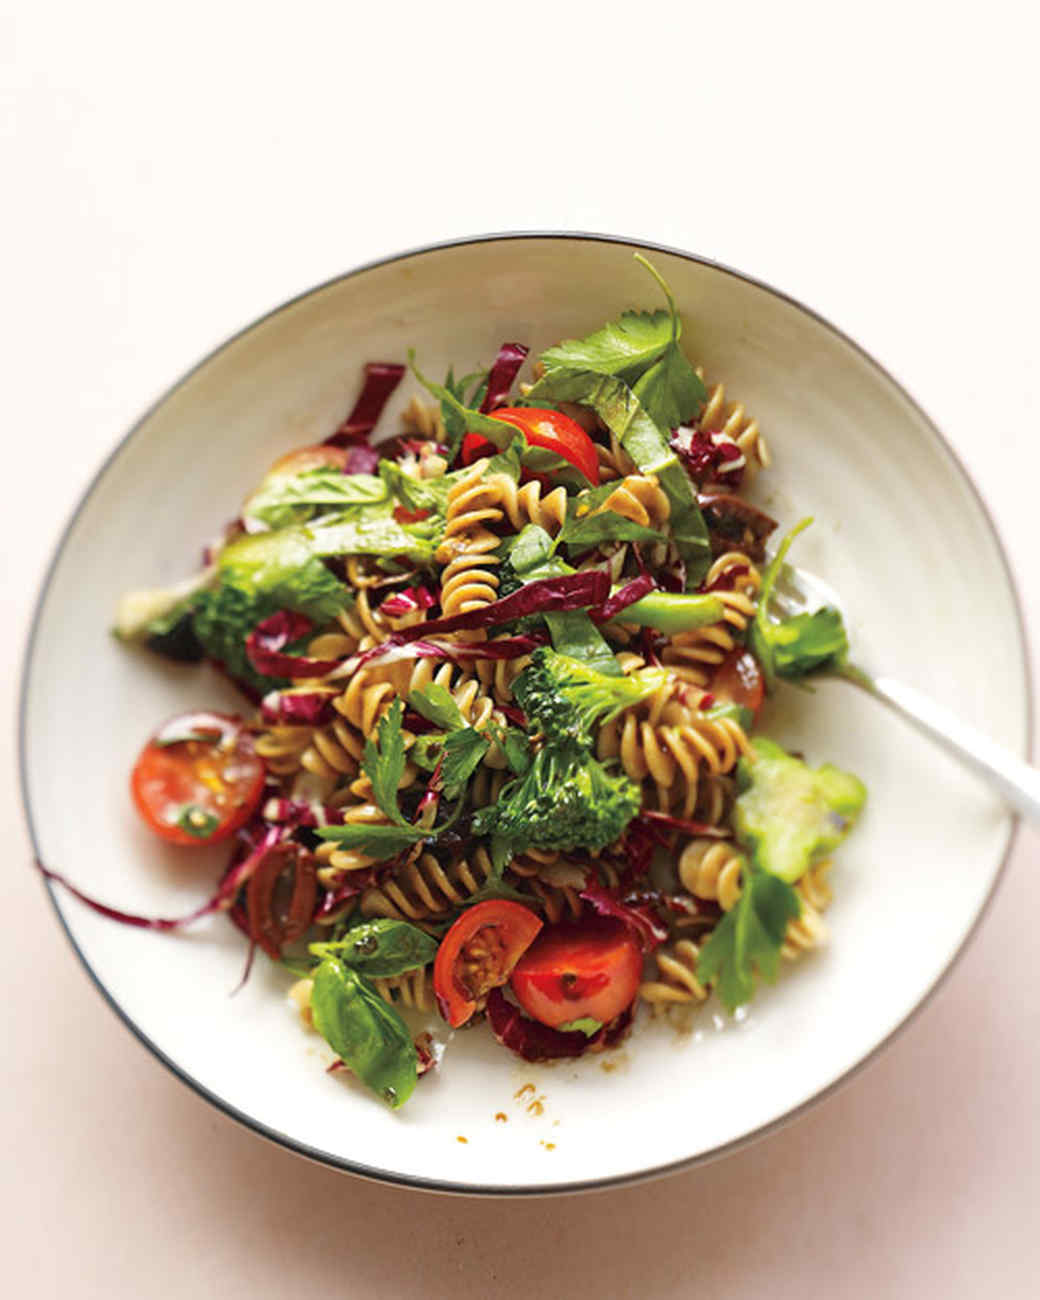 Italian Pasta Salad Recipes: Cue the Olives, Mozzarella, and Arugula